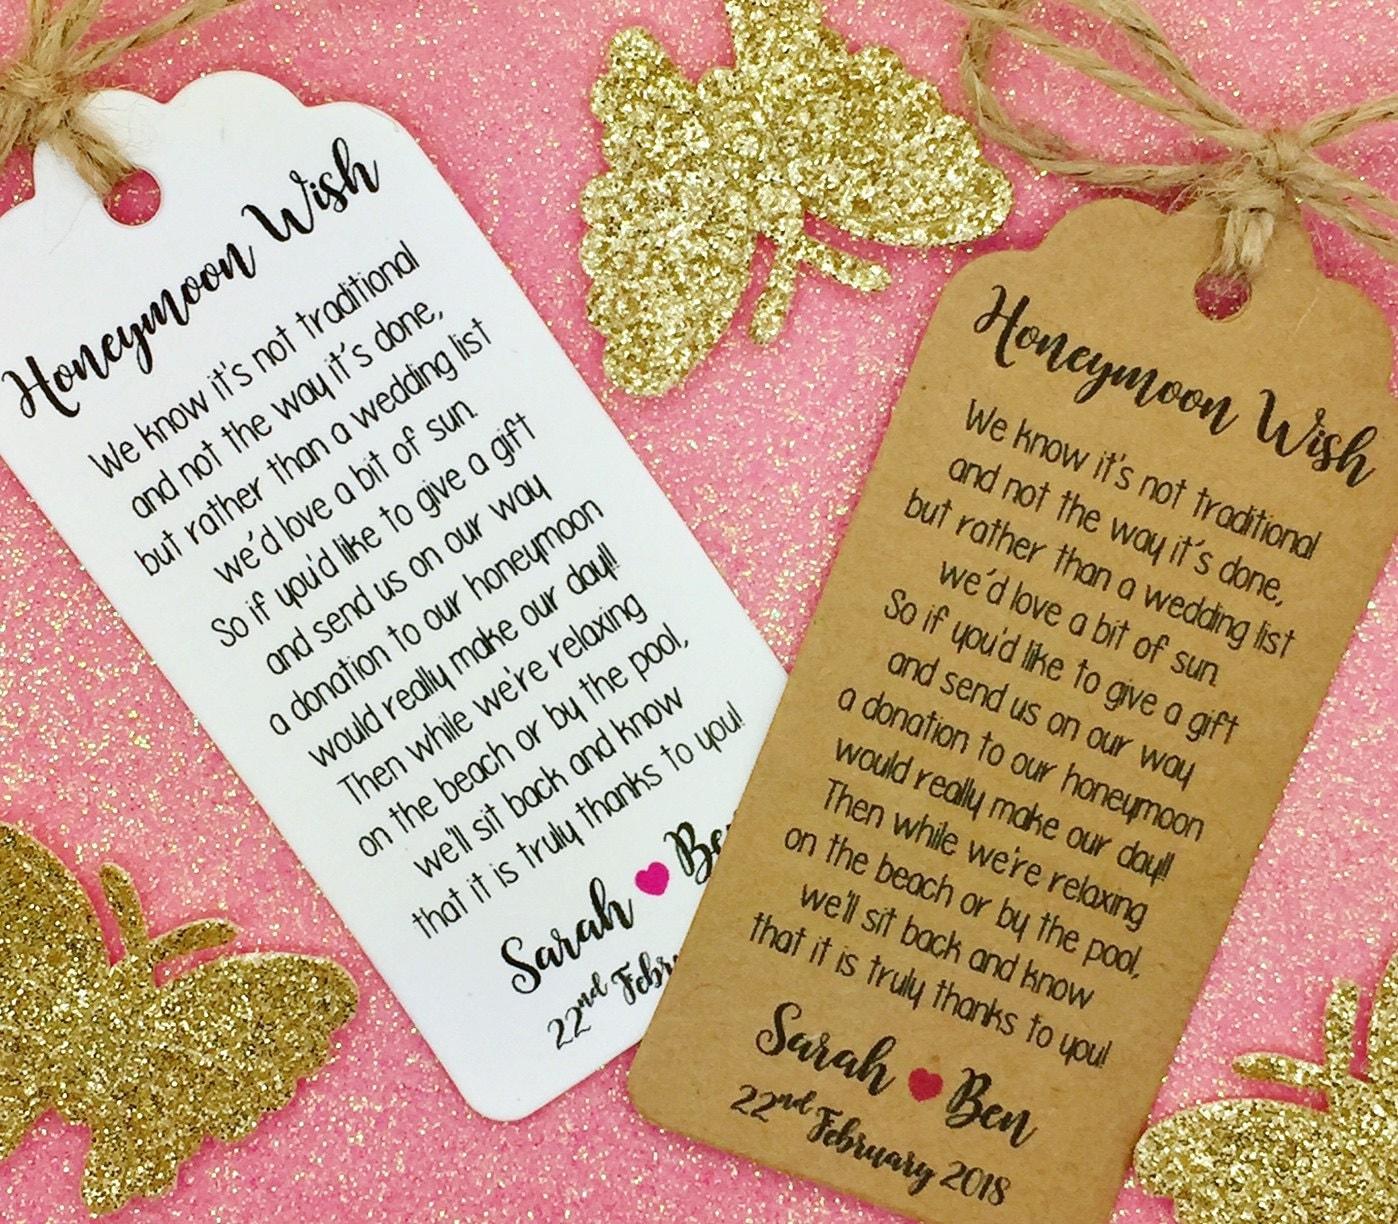 Wedding Gift Poems For Money For Honeymoon: Wedding Honeymoon Fund Money Request Poem Card Favour Gift